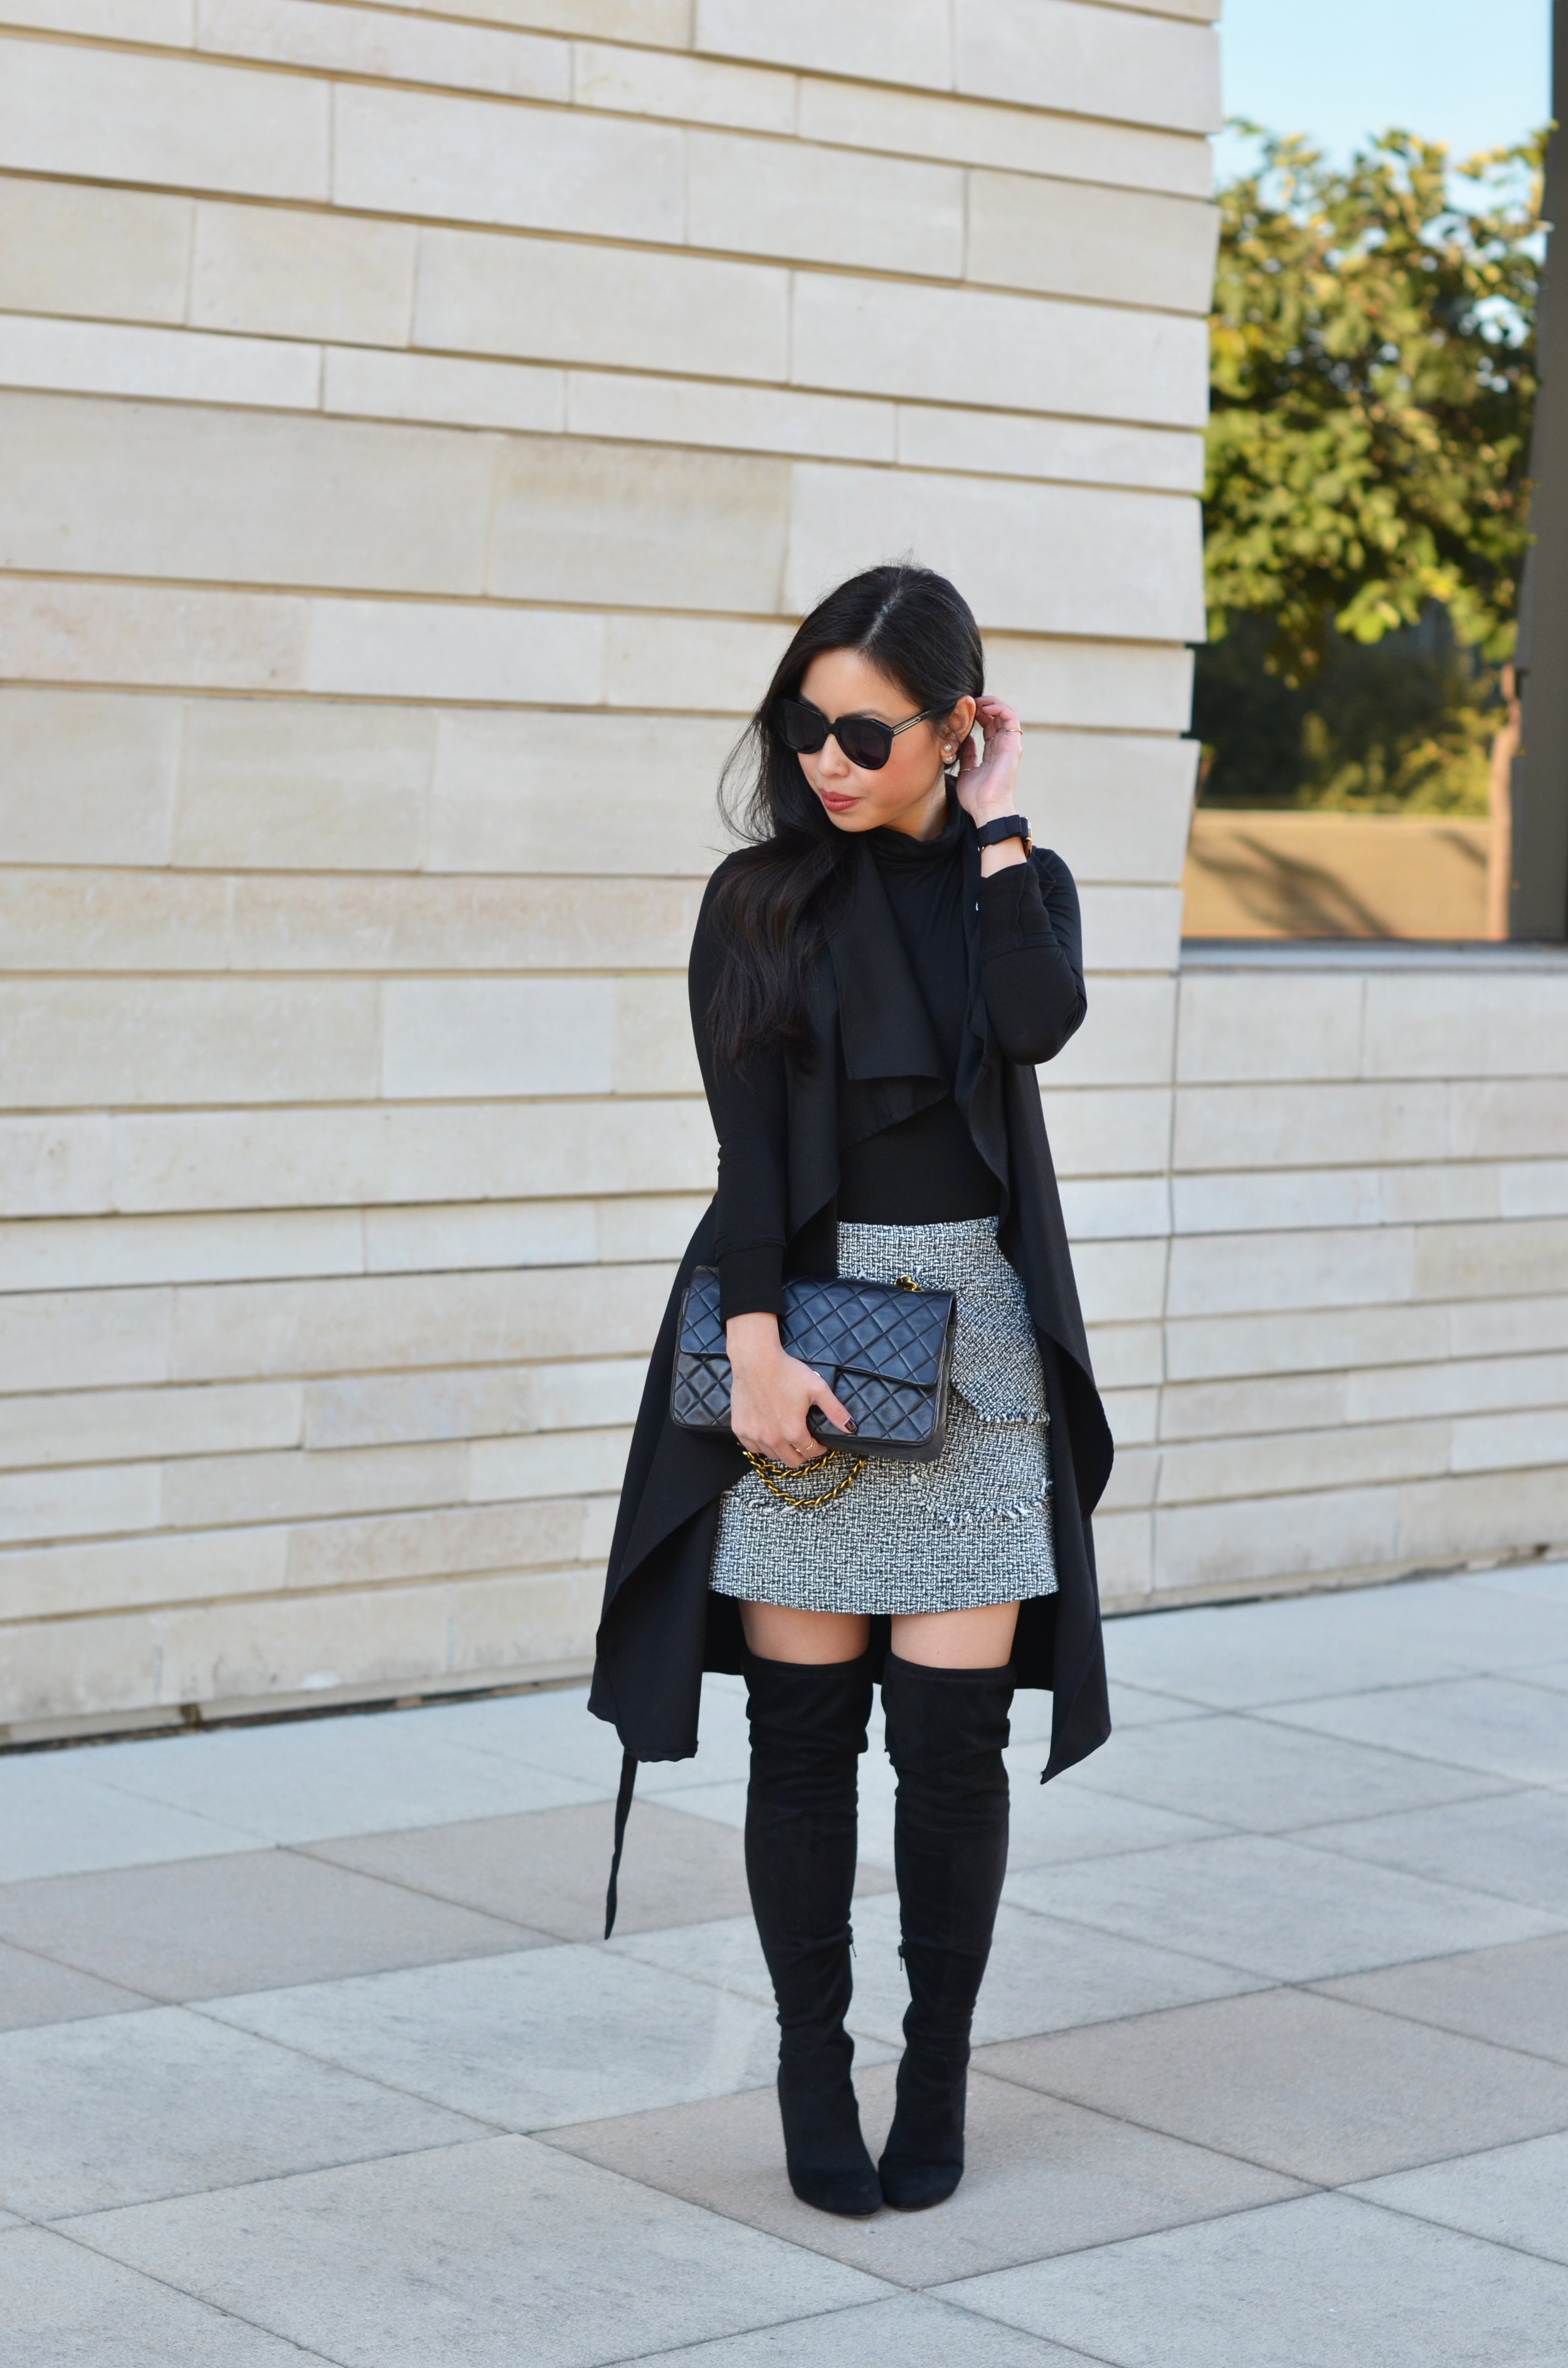 the-tweed-skirt-over-the-knee-boots-jannadoan.com